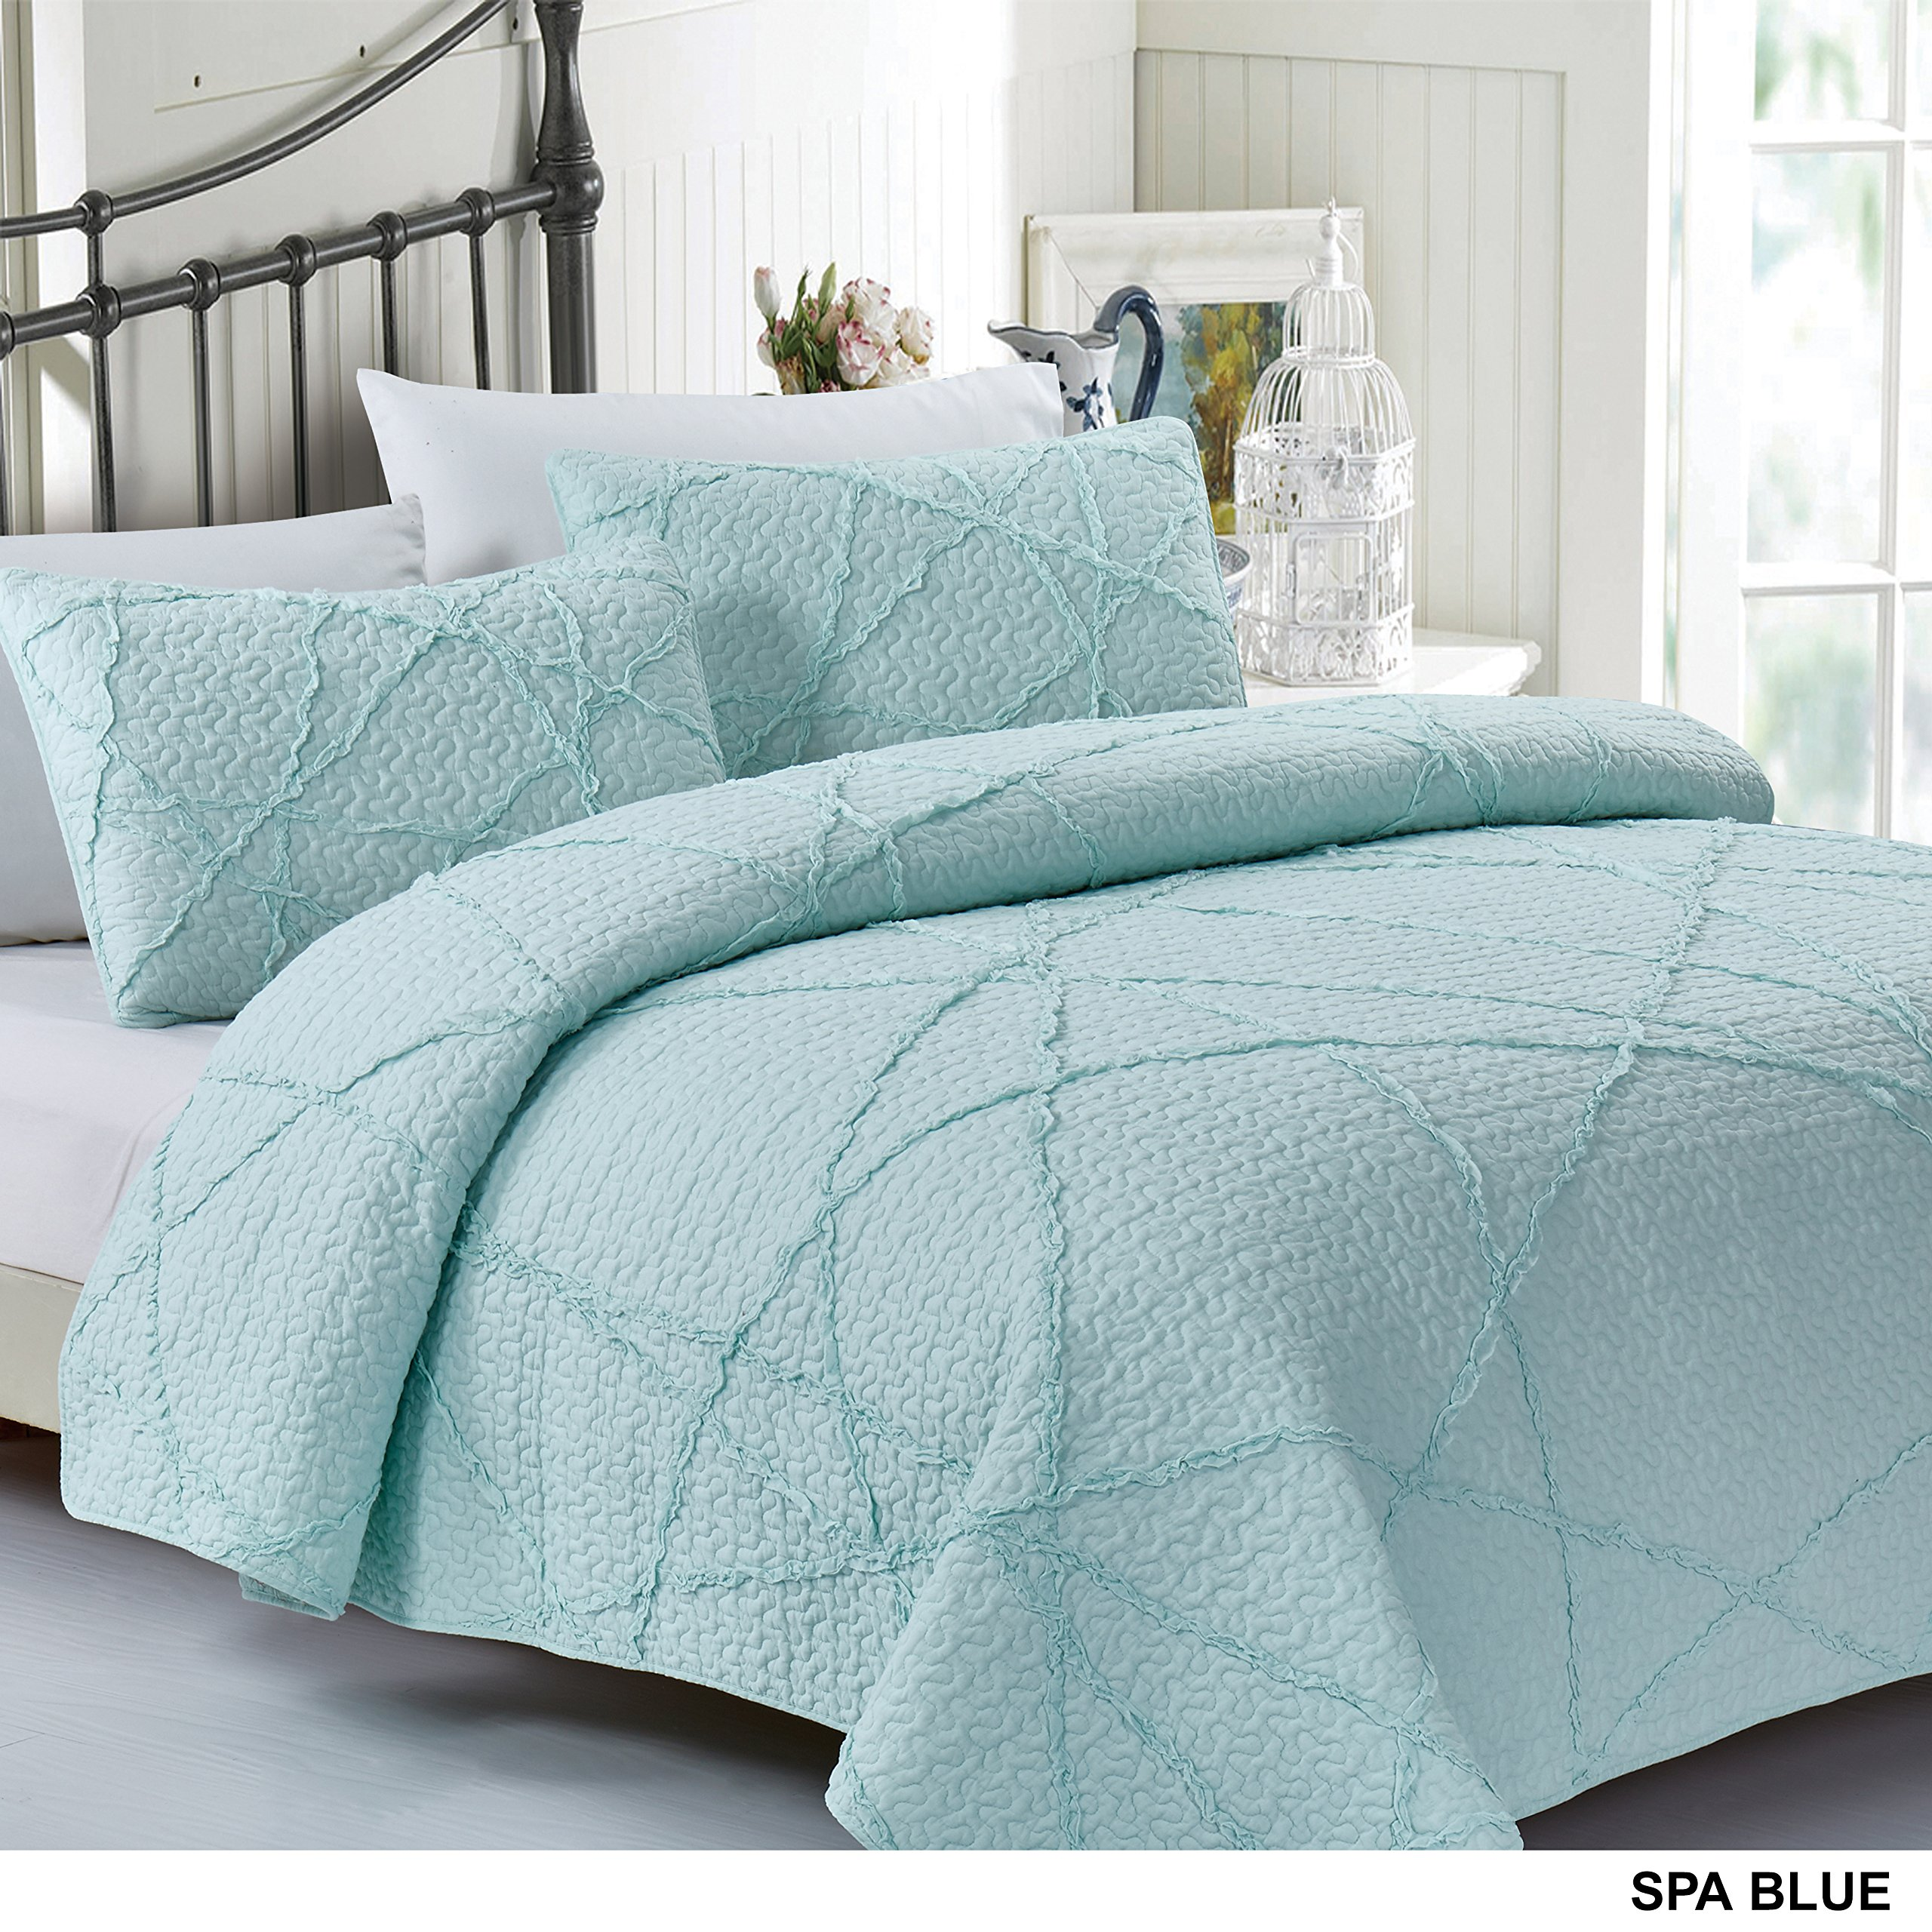 California Design Den Crazy Ruffled Quilt Set, King, Spa Blue